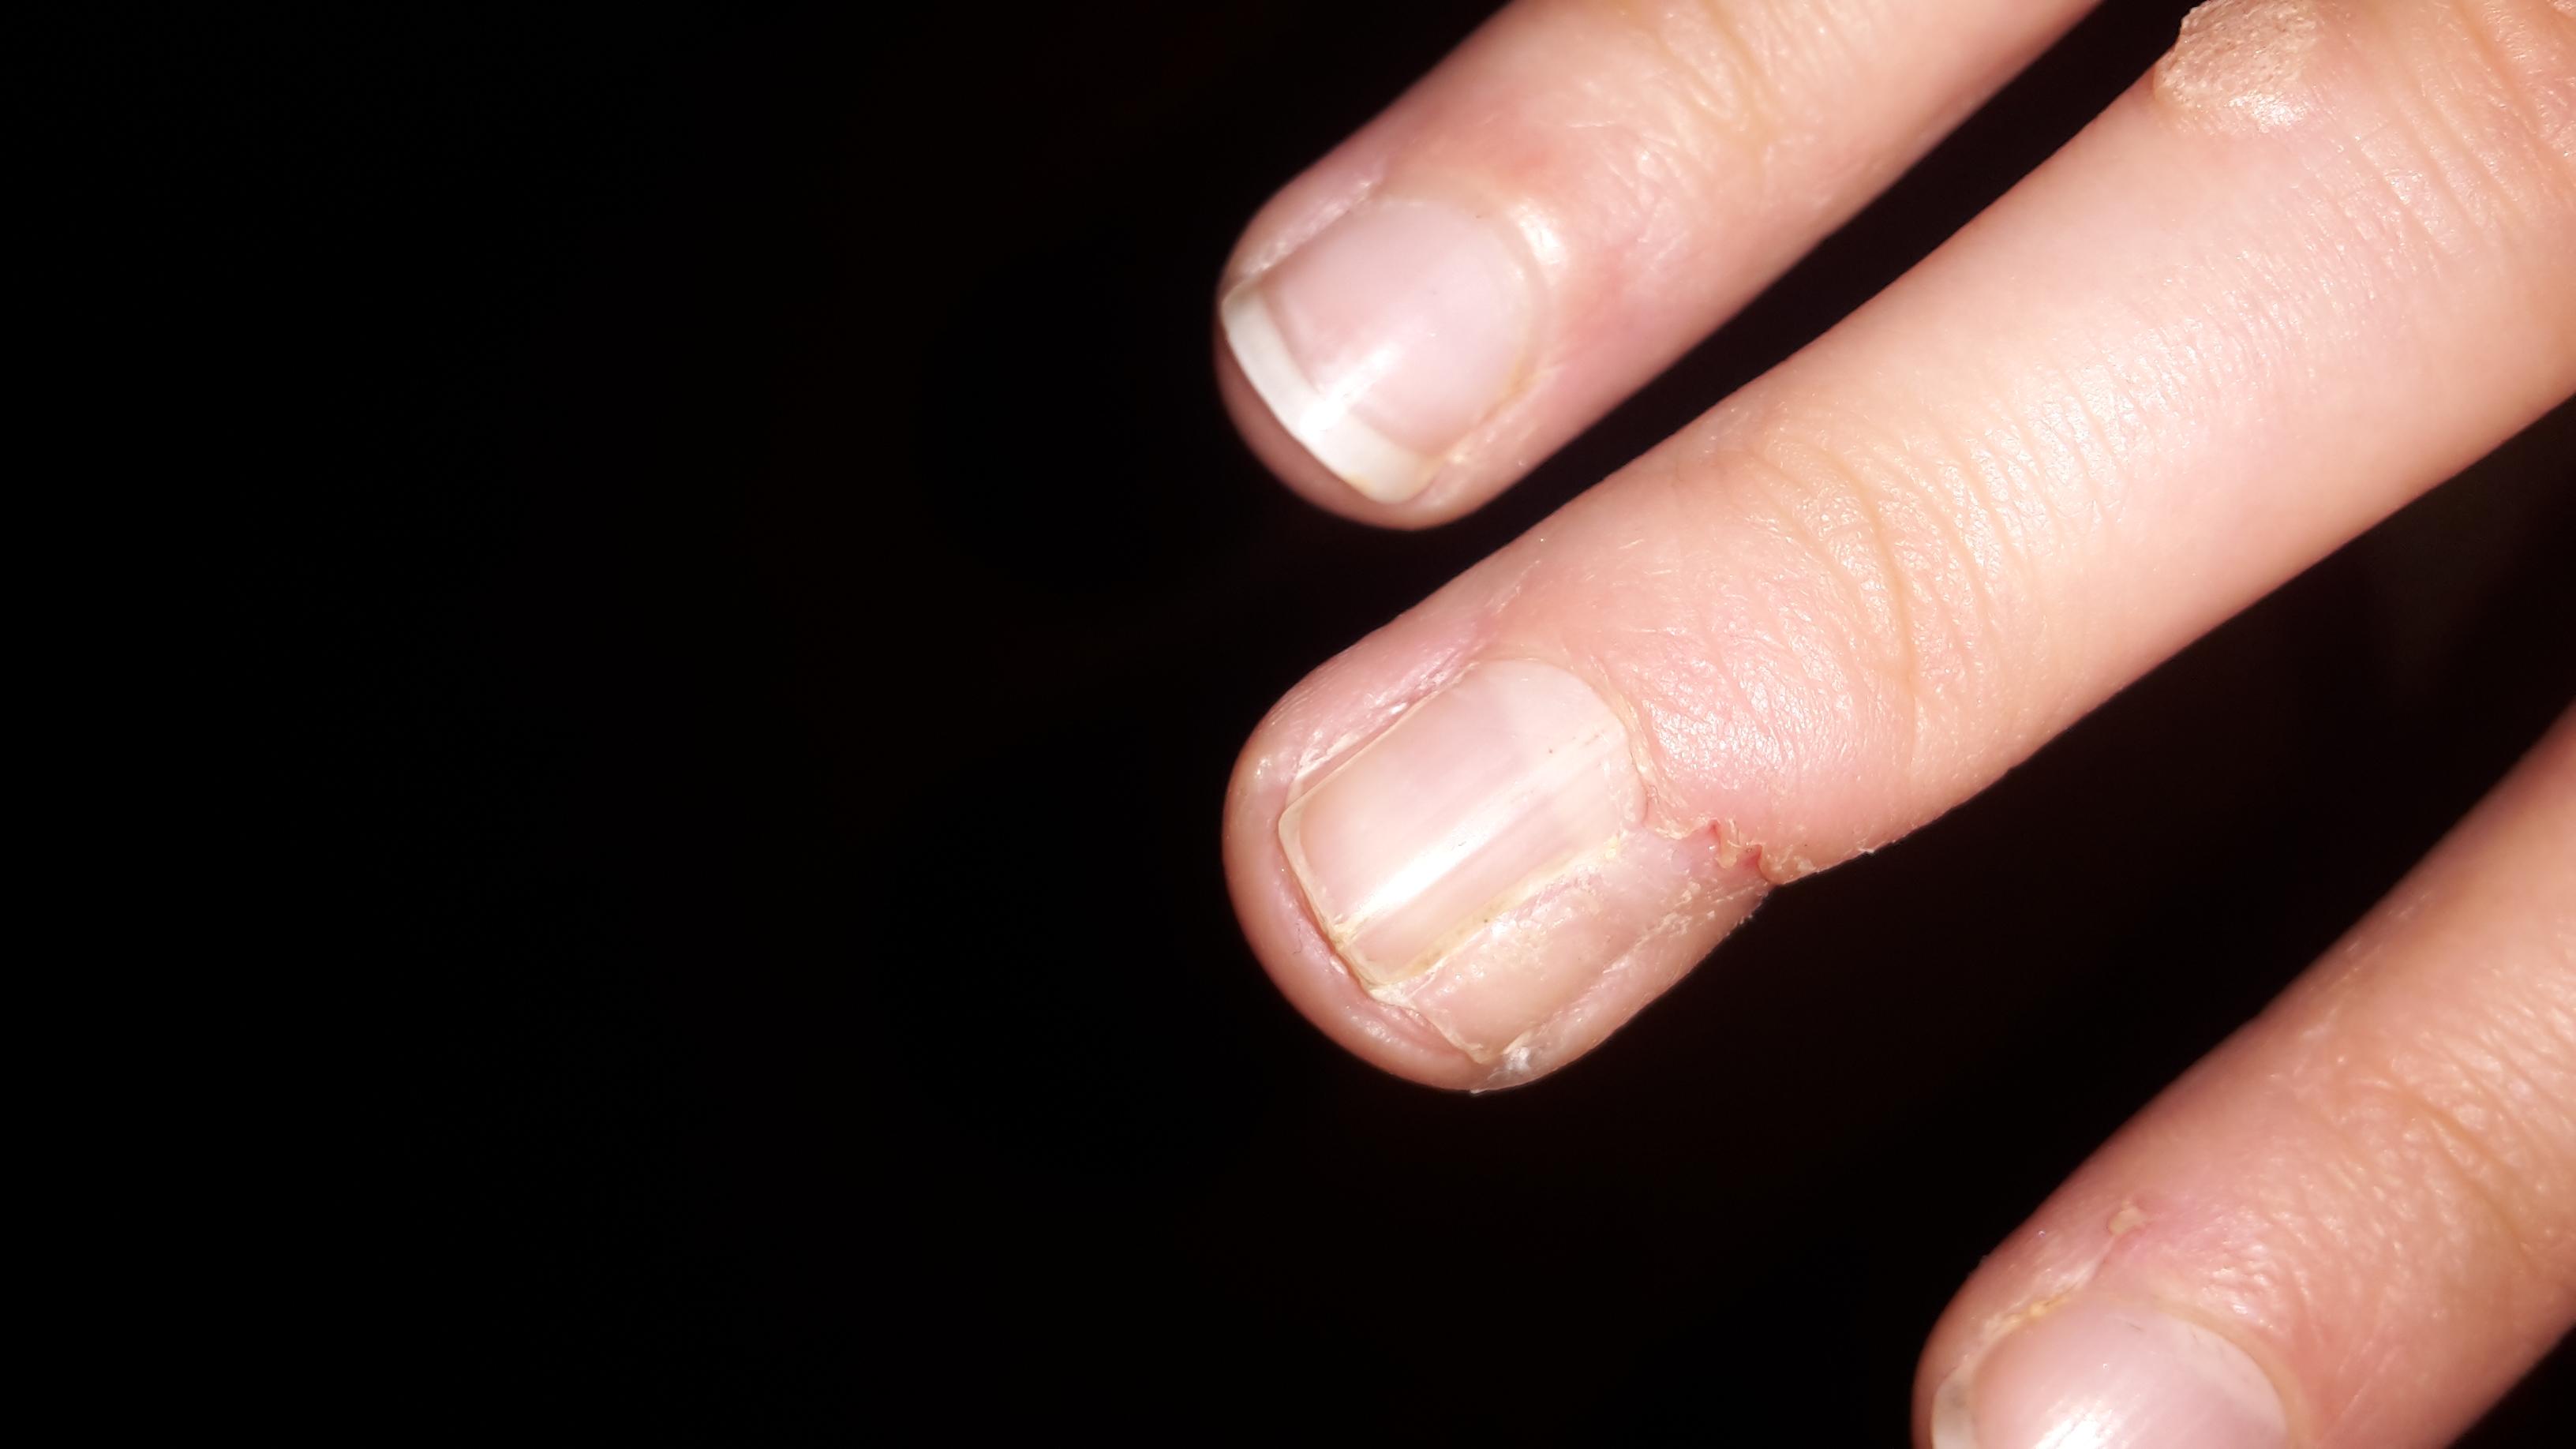 Fingernagel gespalten, Nagel entfernen? (Operation, Arzt, Verletzung)